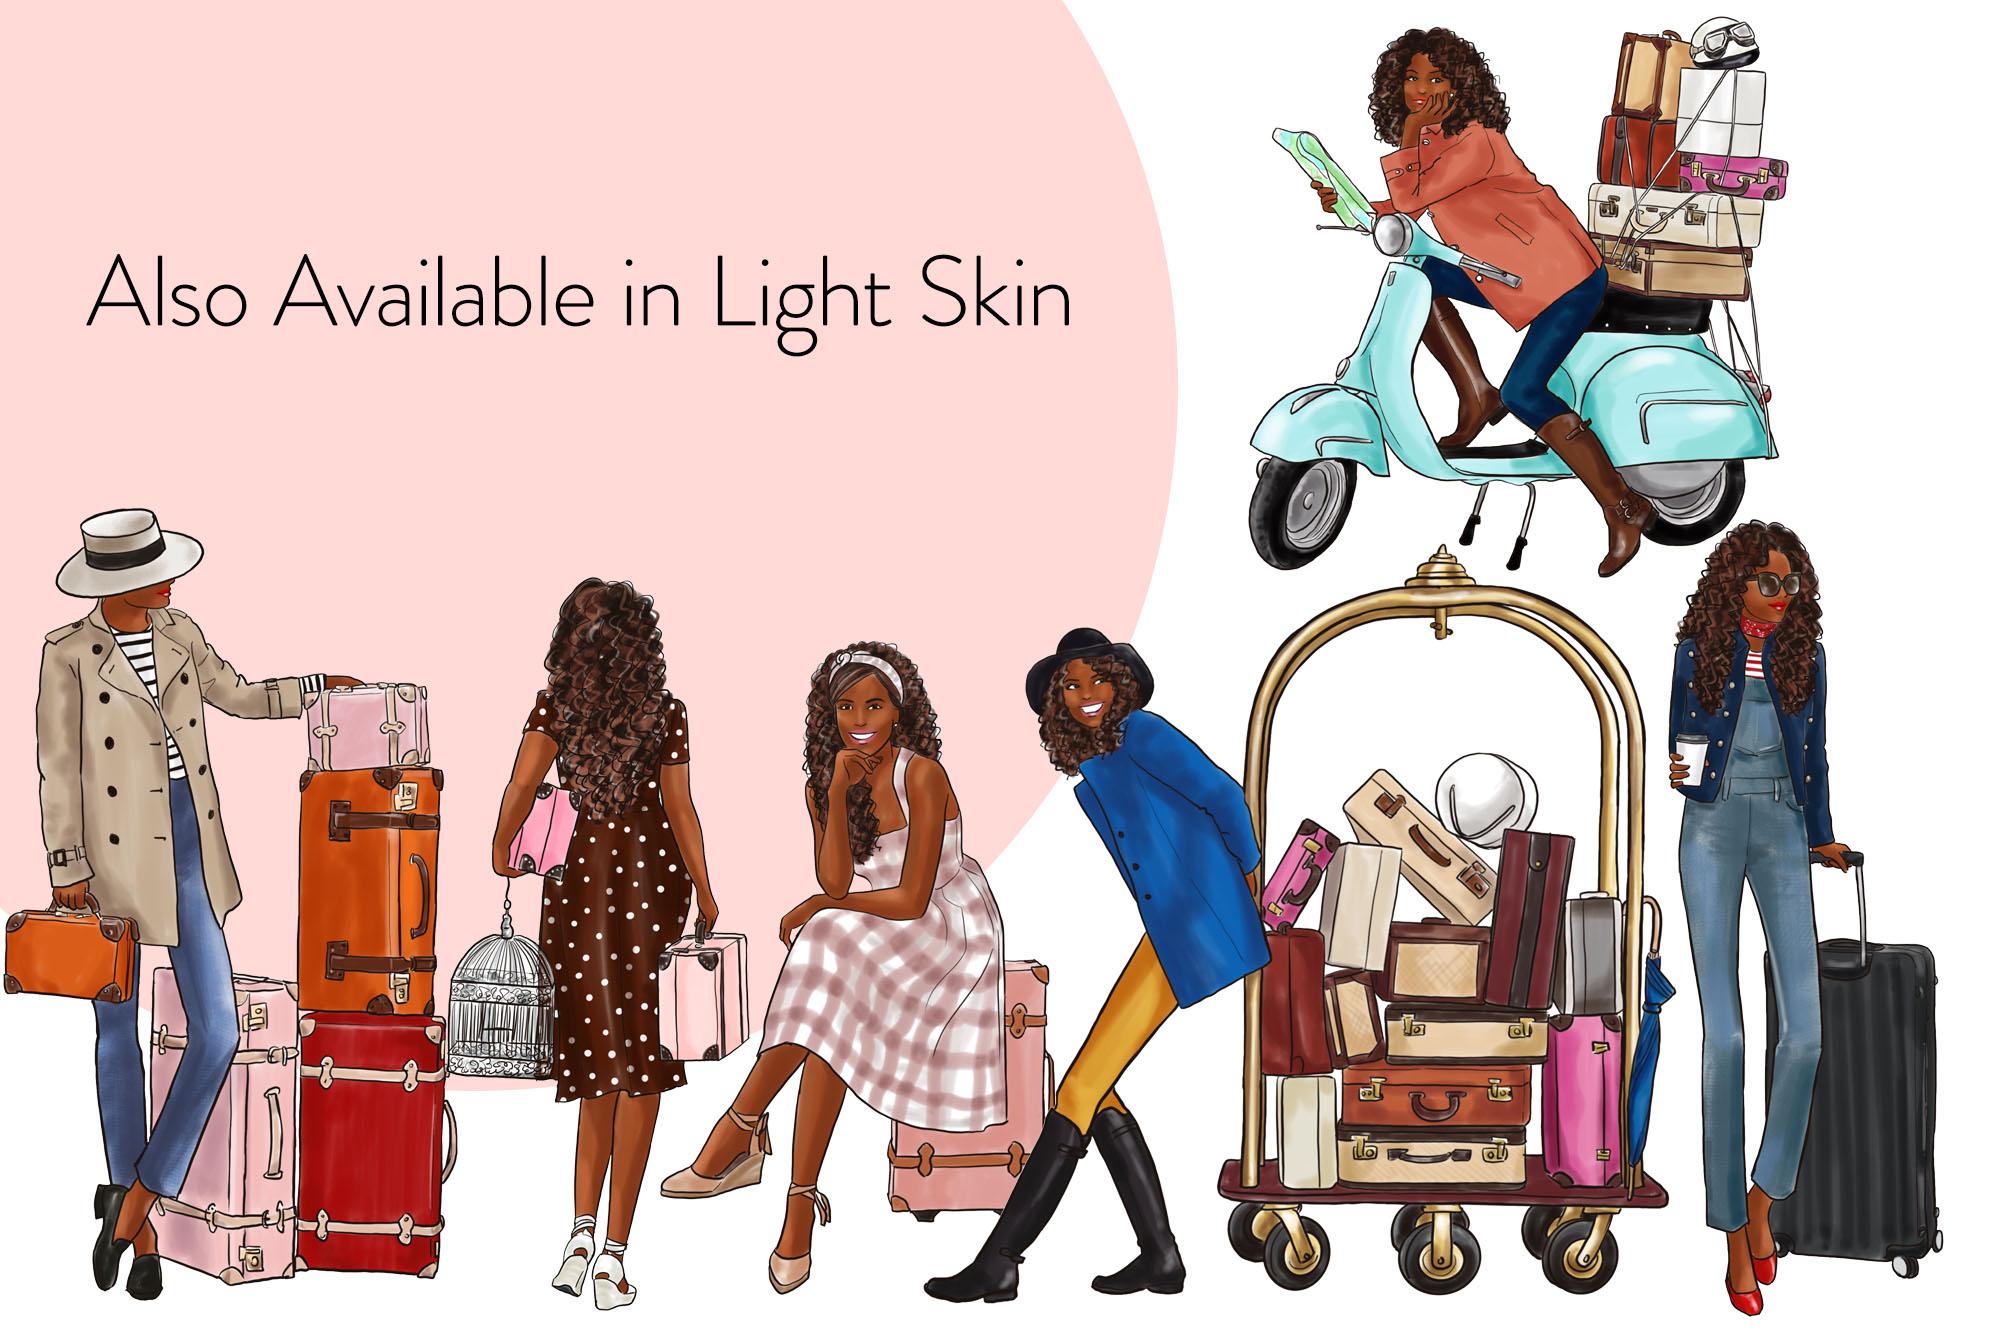 Fashion illustration clipart - Travel Girls 3 - Light Skin example image 4